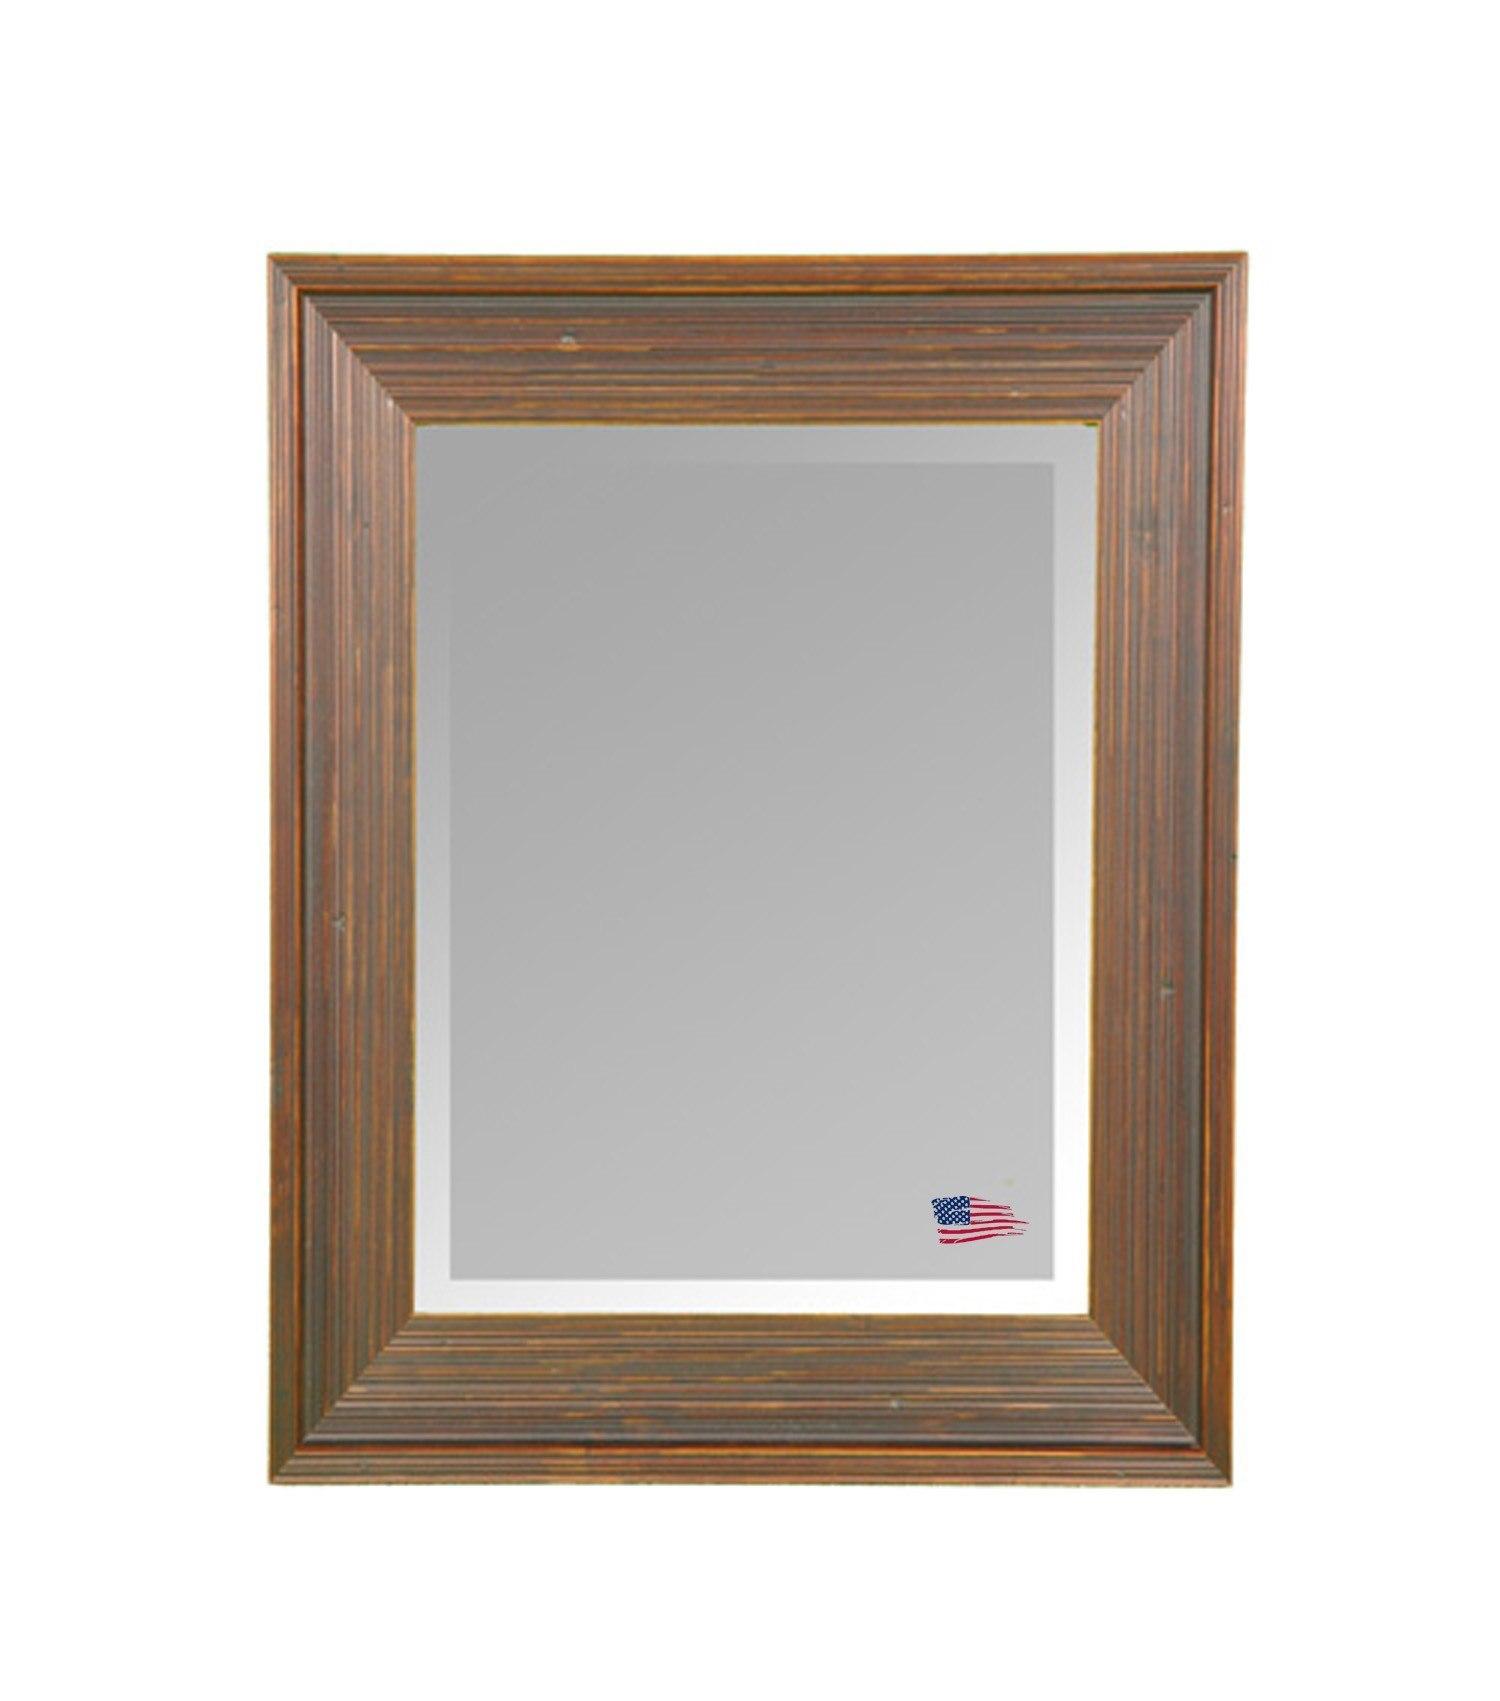 Rayne Mirrors R0017ML2 33.75 x 37.75 Inch Barnwood Brown Wall Mirror